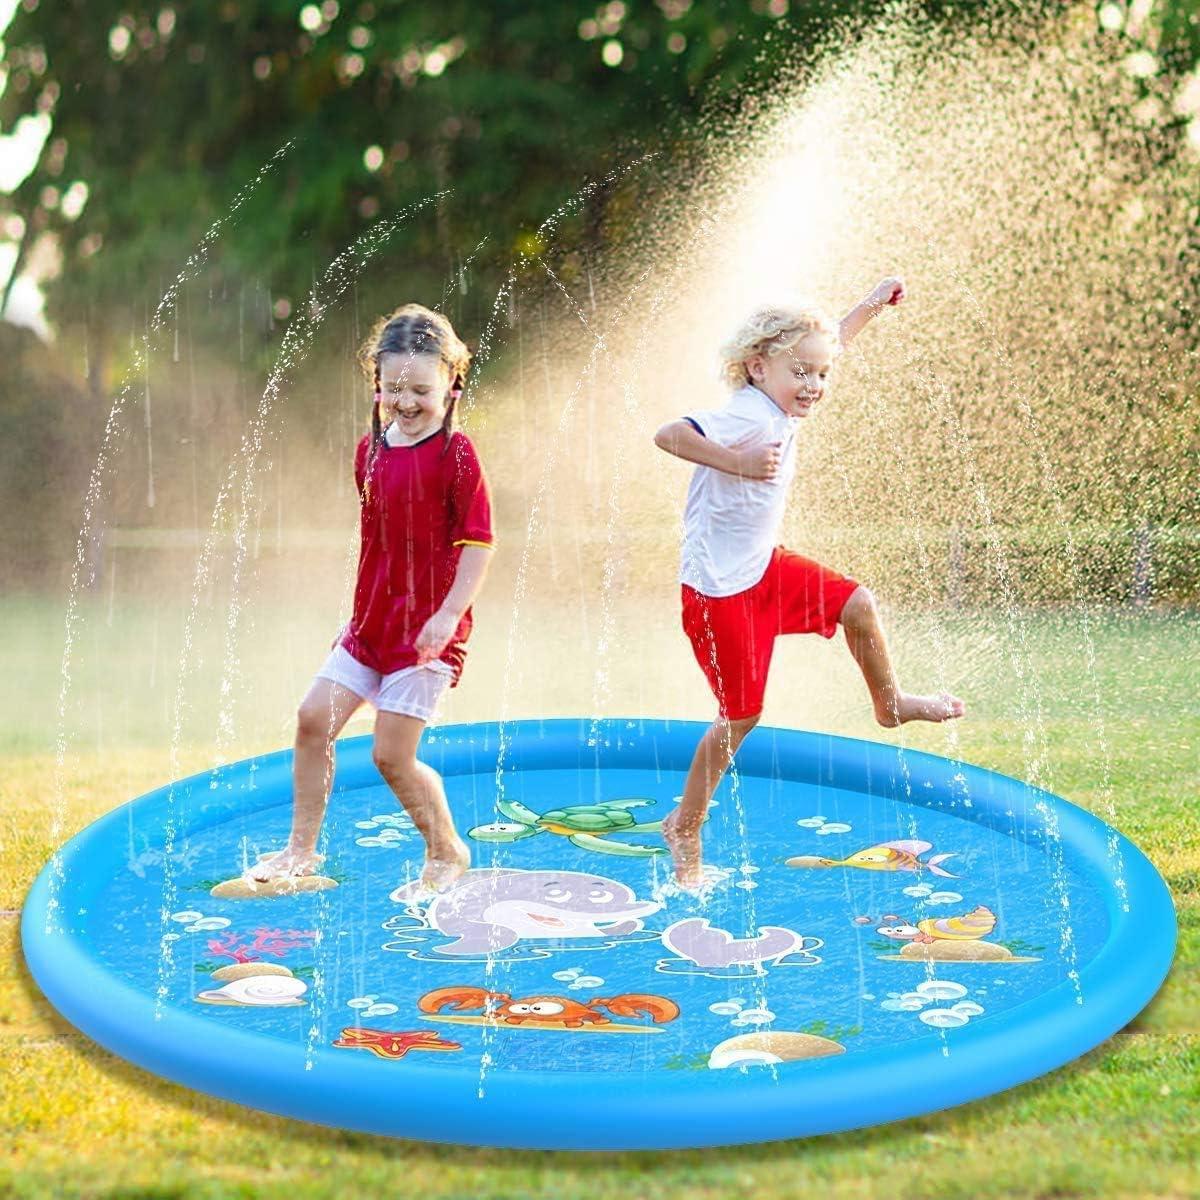 Splash Ranking TOP12 Pad for Toddlers Aitey Fu Kids security Outside Sprinkler 68